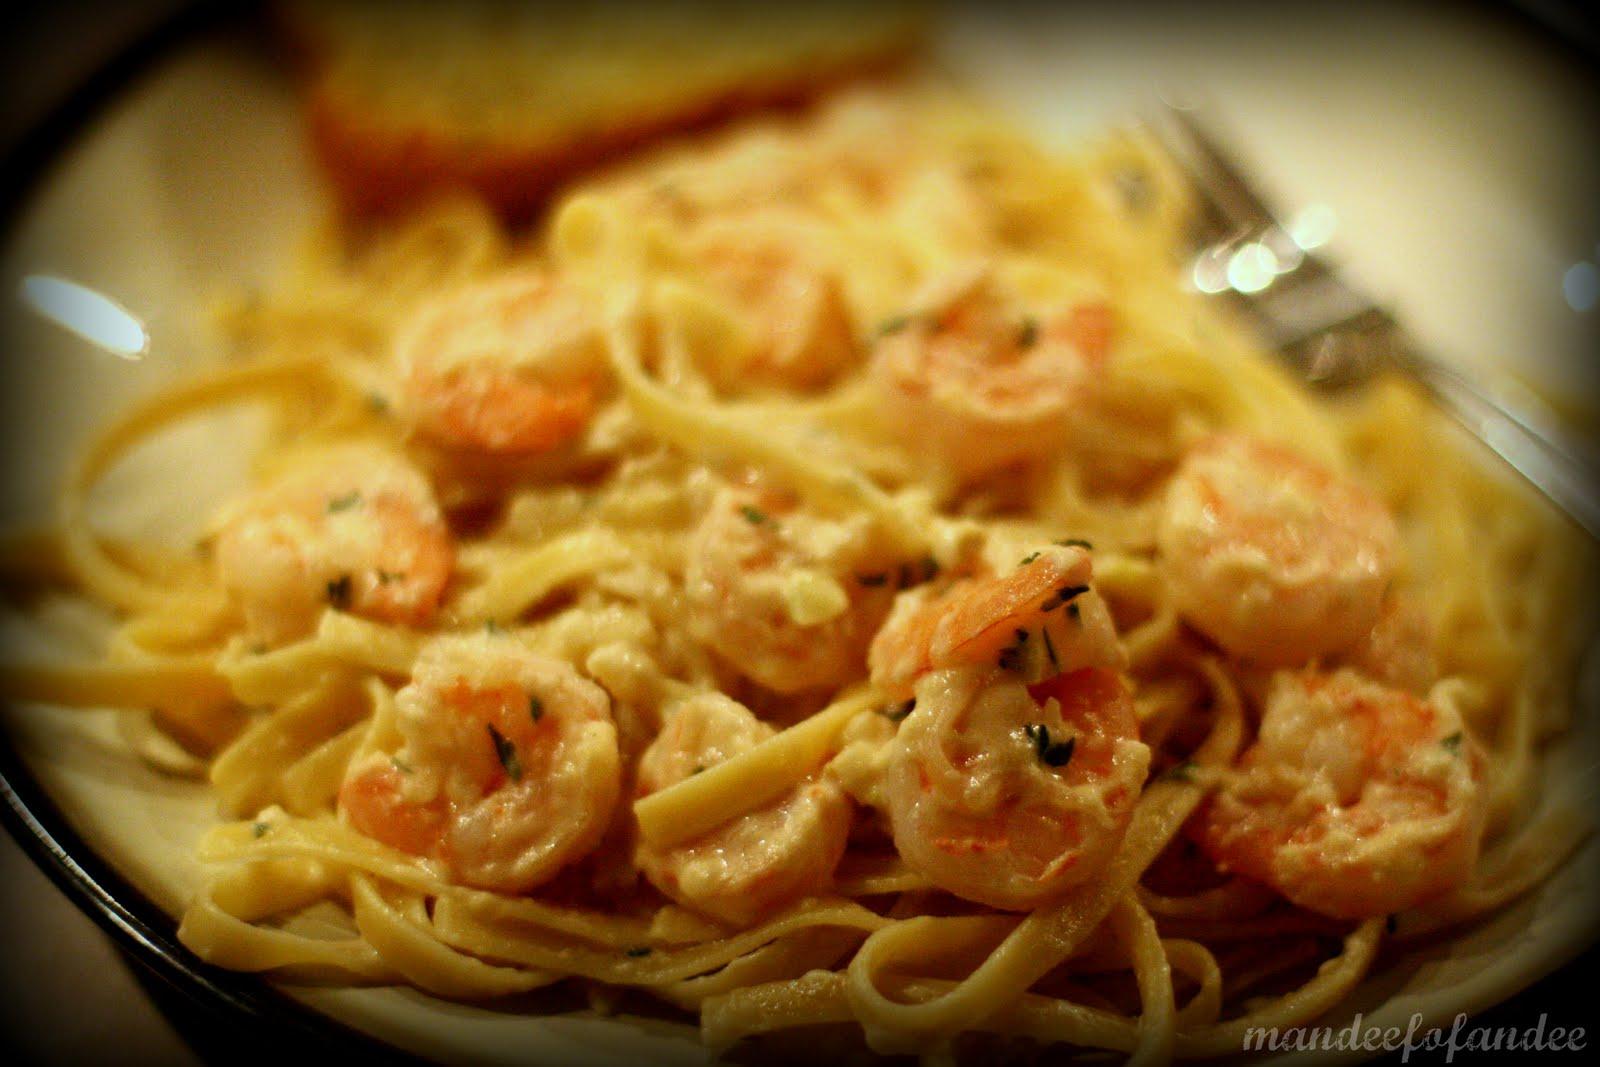 mandeefofandee.: shrimp fettuccine alfredo [recipe]